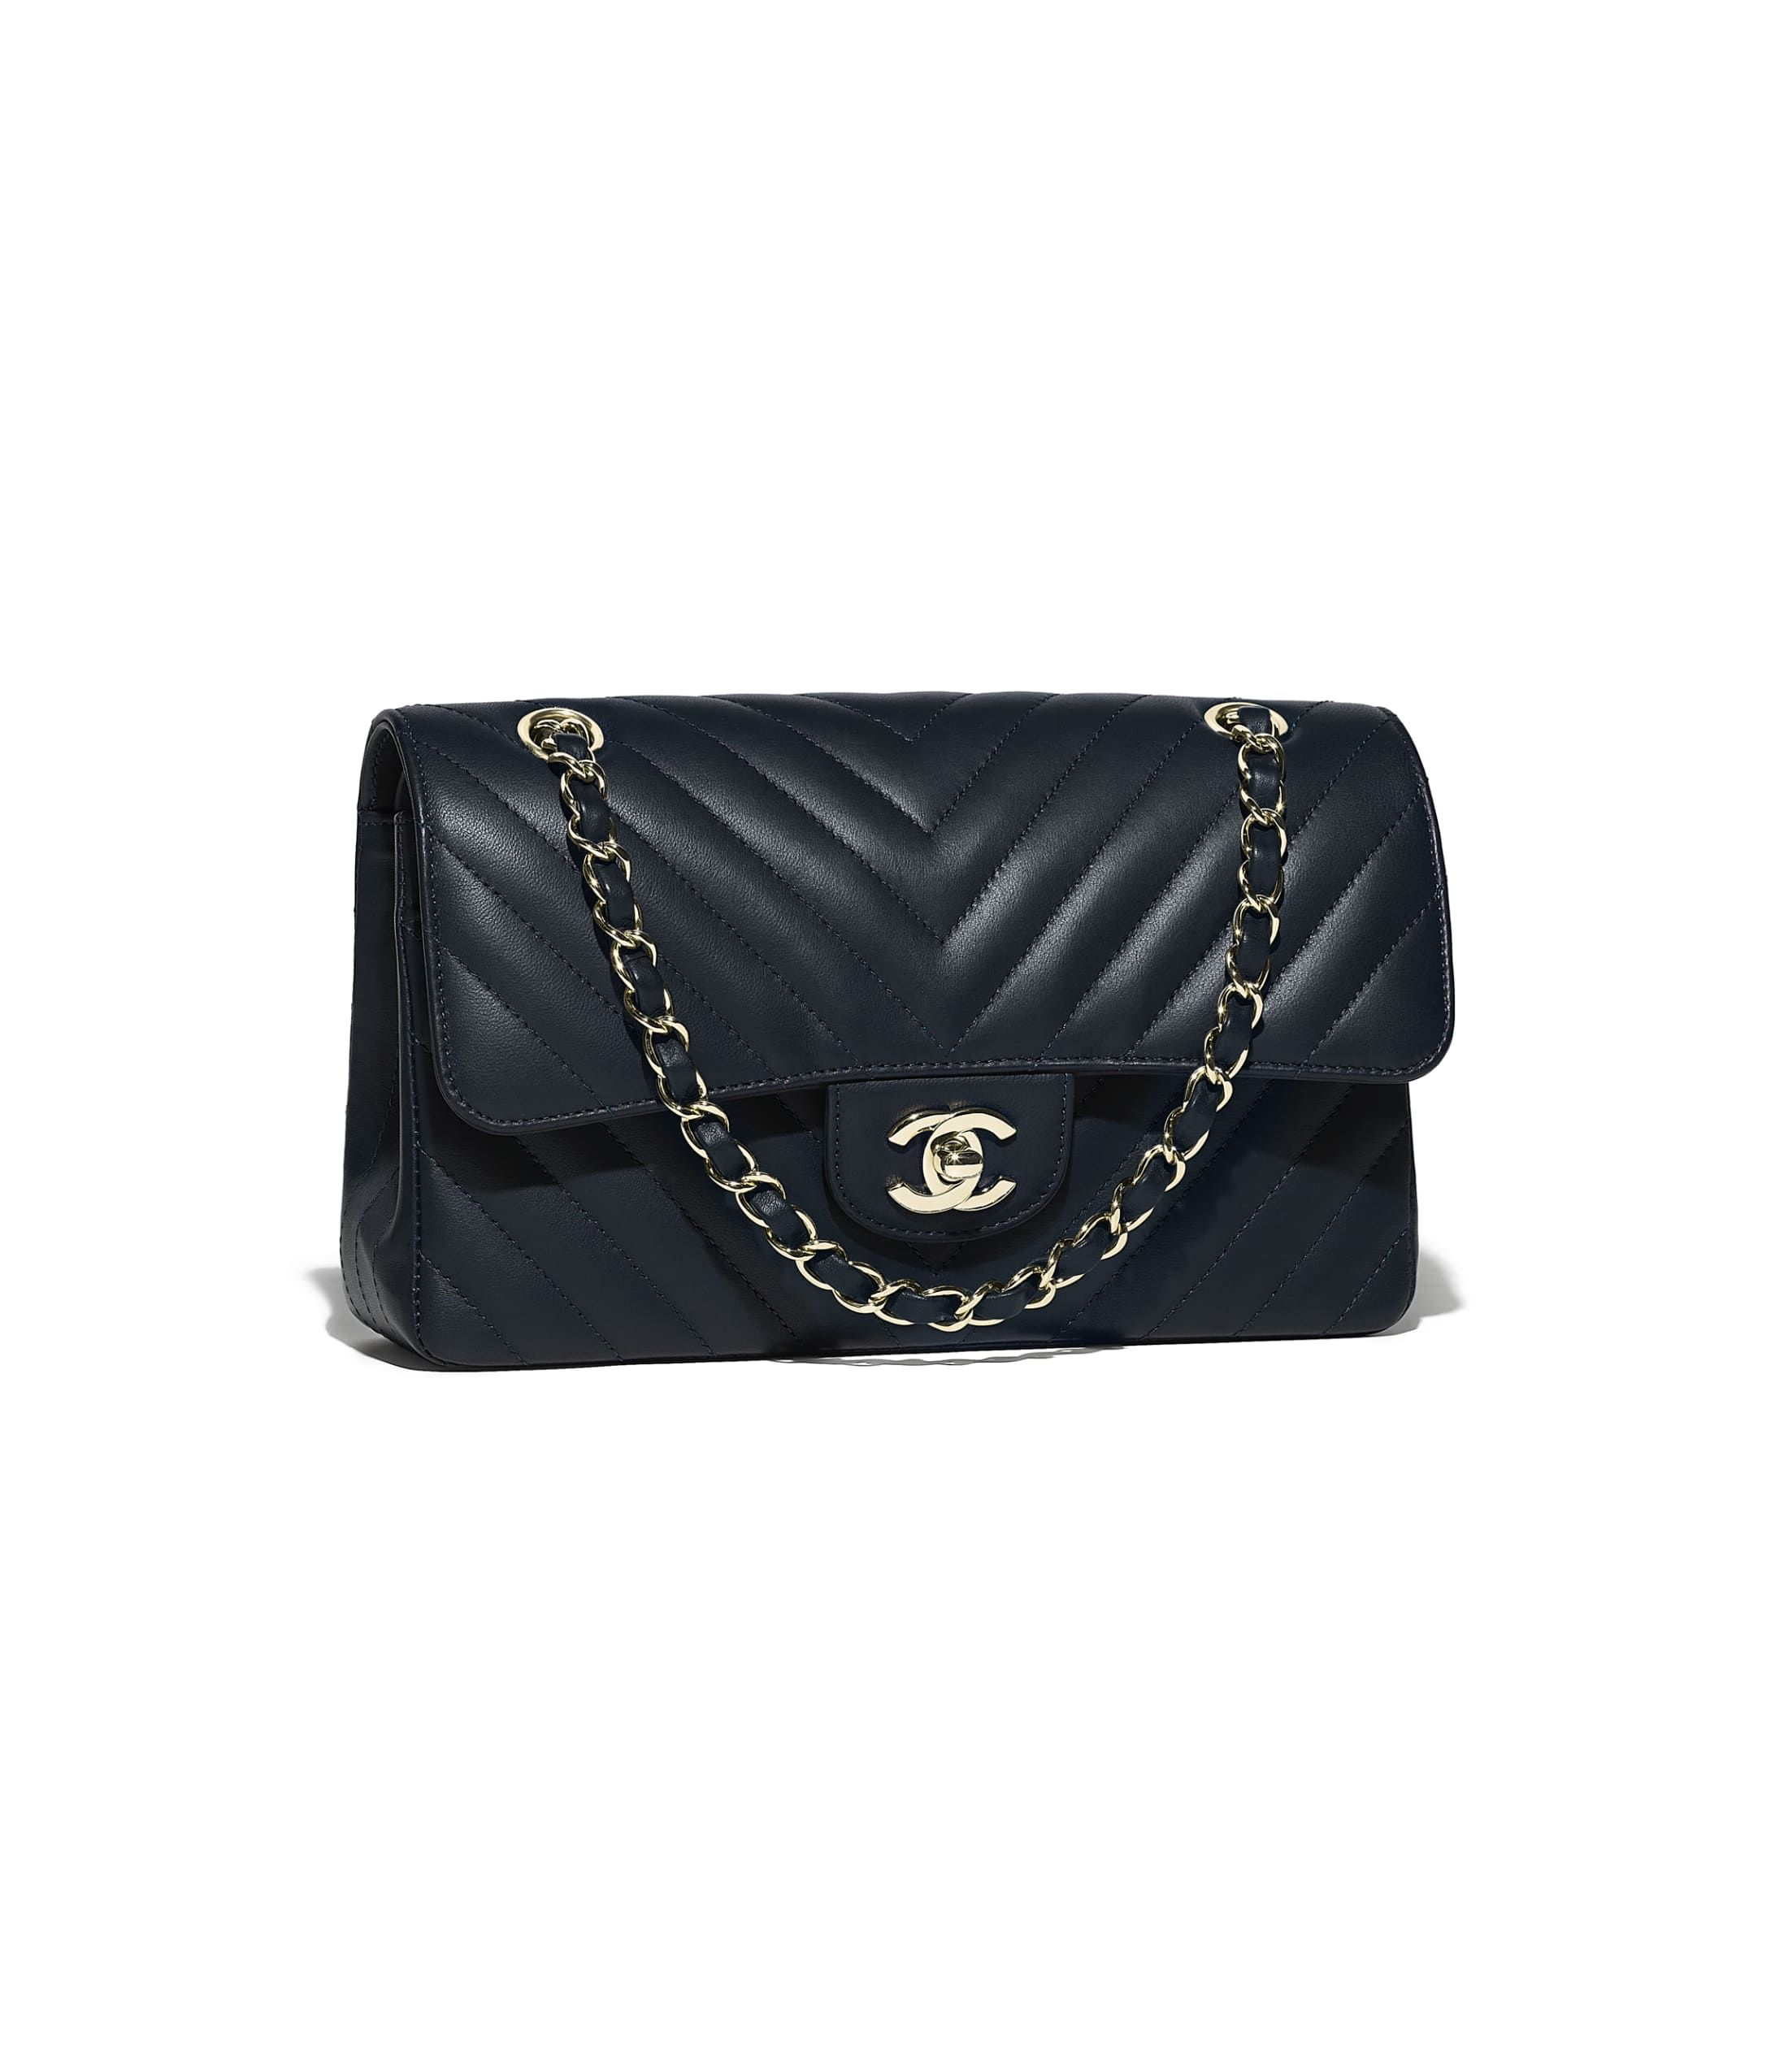 7a36125717cf Chanel Small Bag, Novelty Bags, Classic Handbags, Prada Handbags, Big  Handbags,